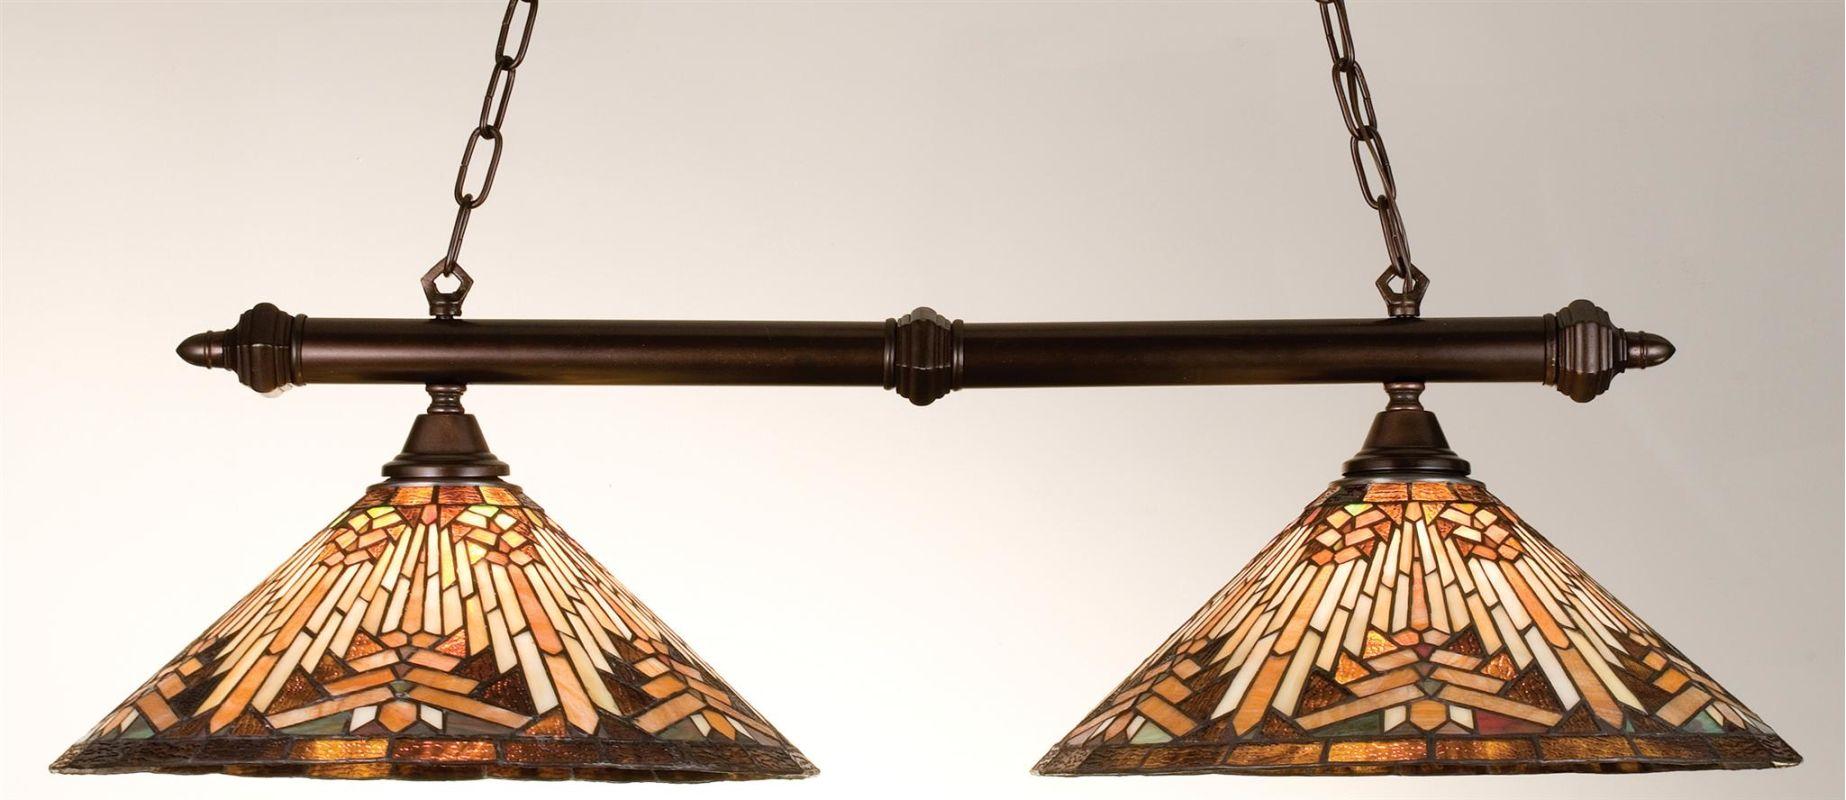 Meyda Tiffany 18858 Stained Glass / Tiffany Island / Billiard Fixture